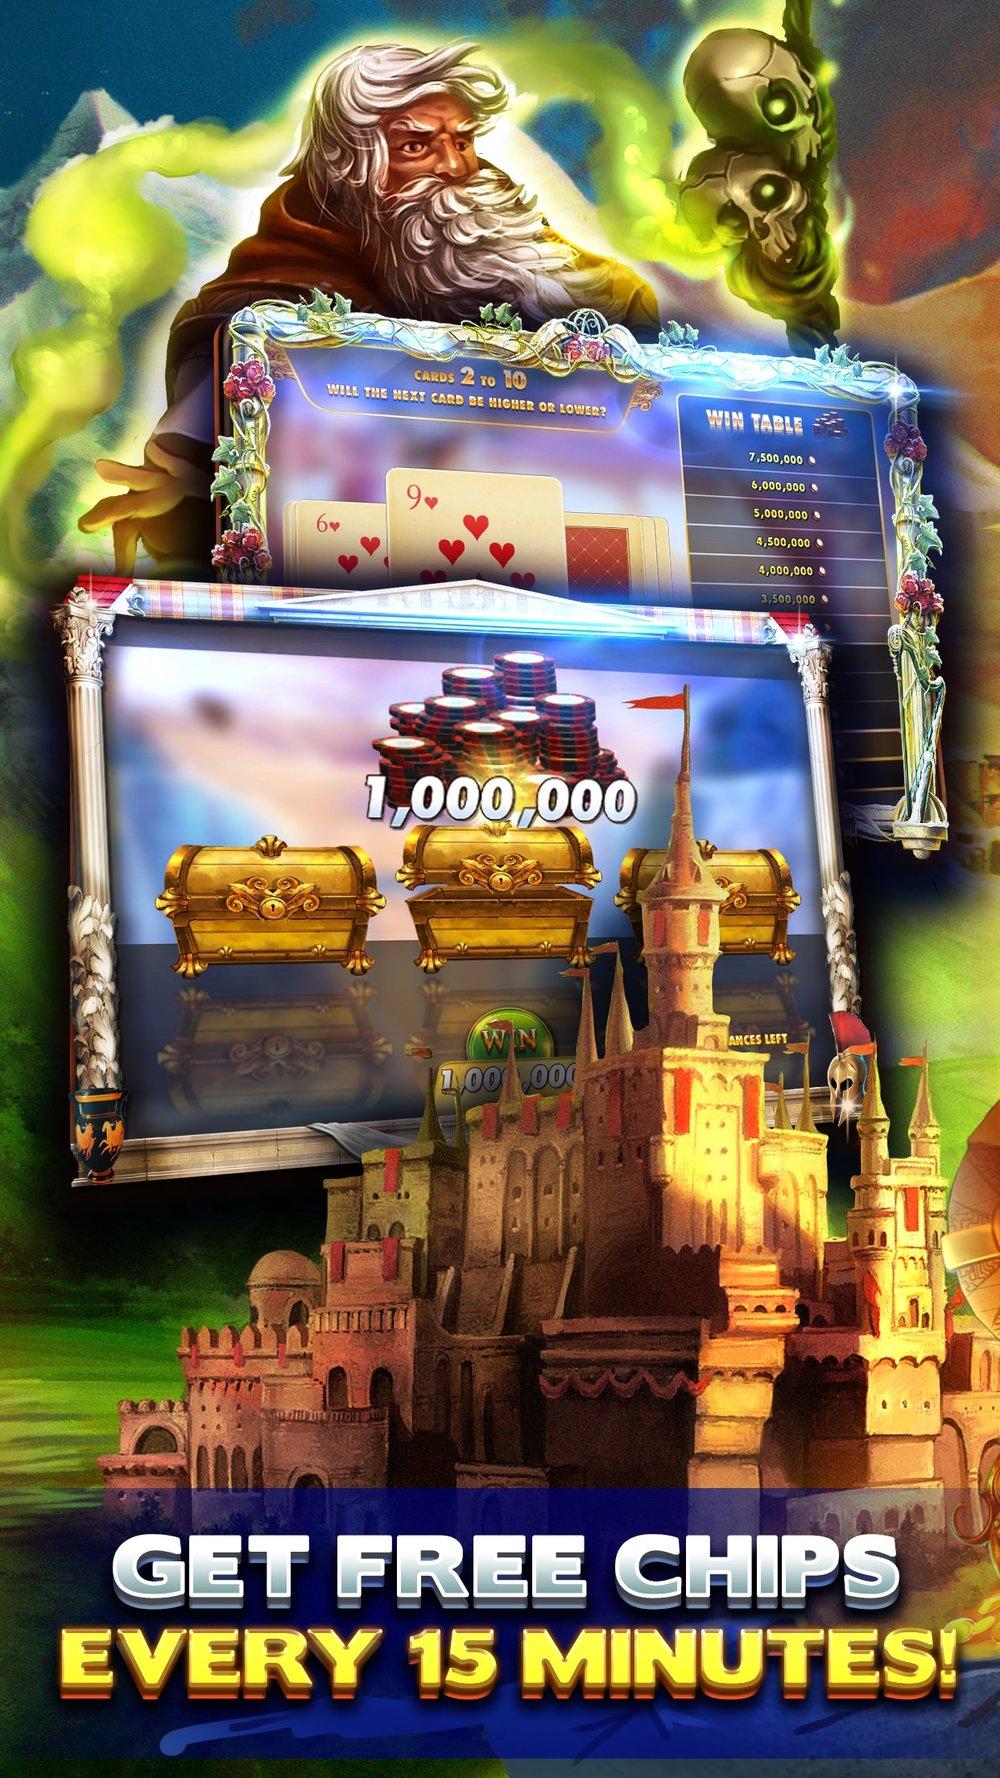 Slots casino adventures codes online poker beginners guide